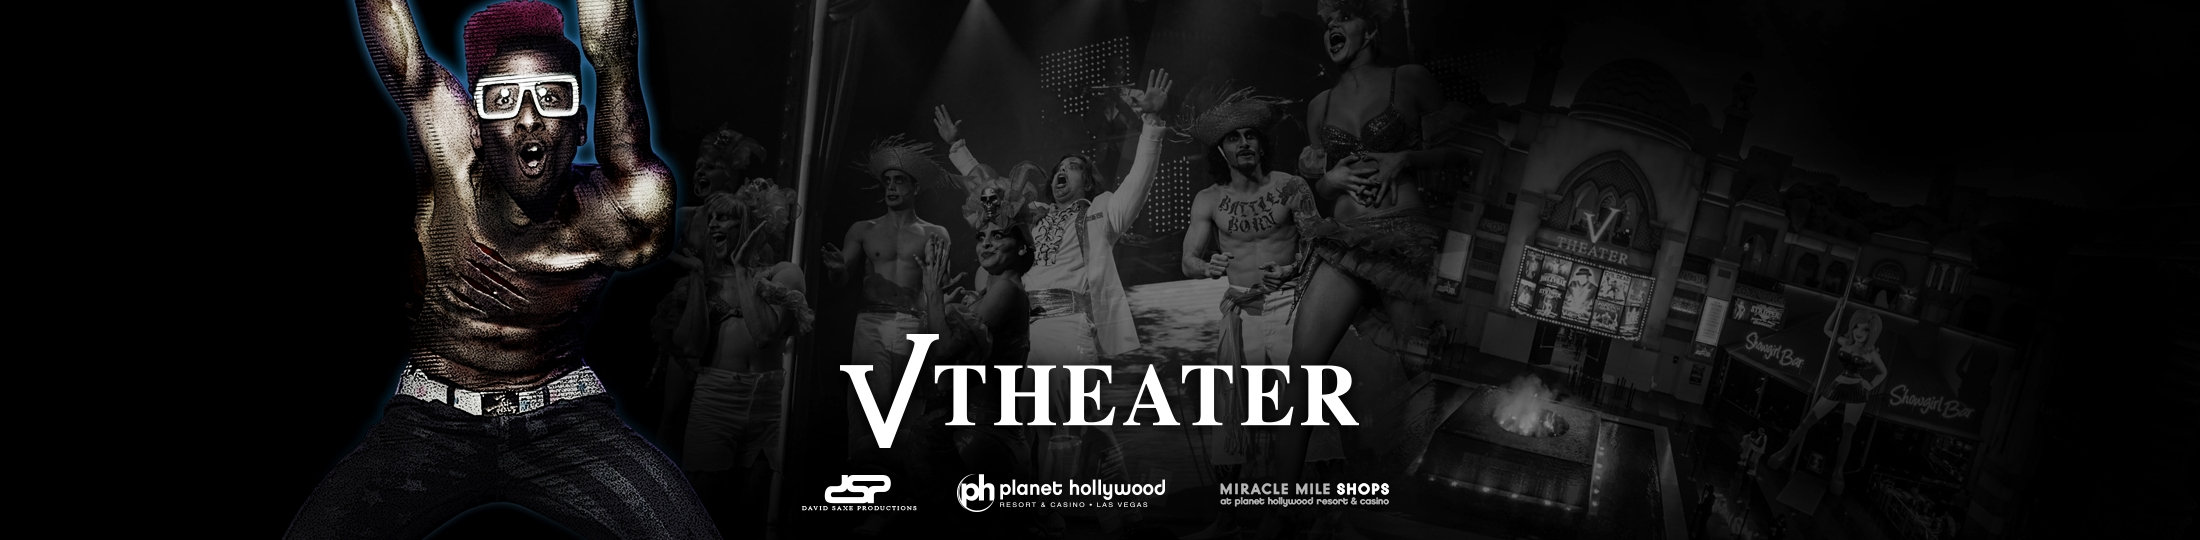 Las Vegas Theaters